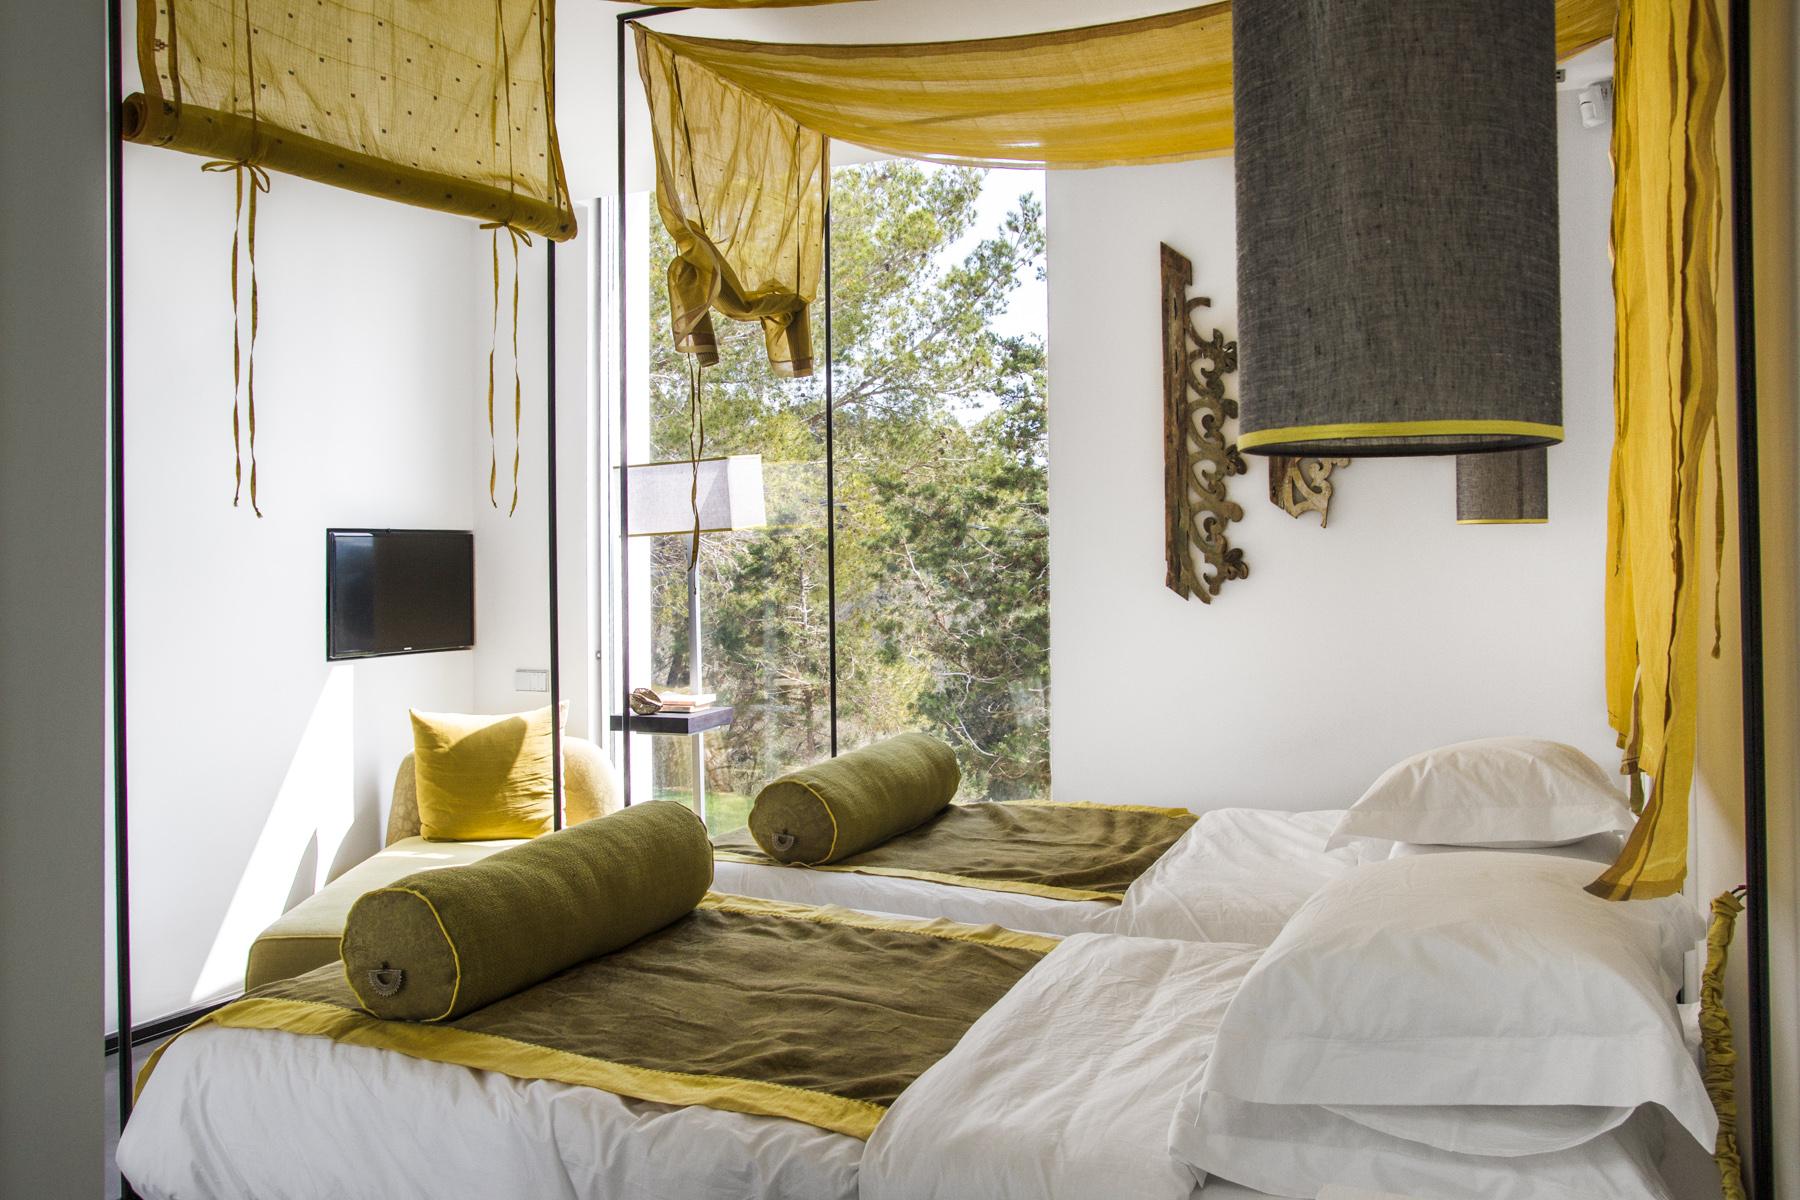 https://www.white-ibiza.com/wp-content/uploads/2020/05/white-ibiza-villas-can-zama-bedroom-two-1.jpg